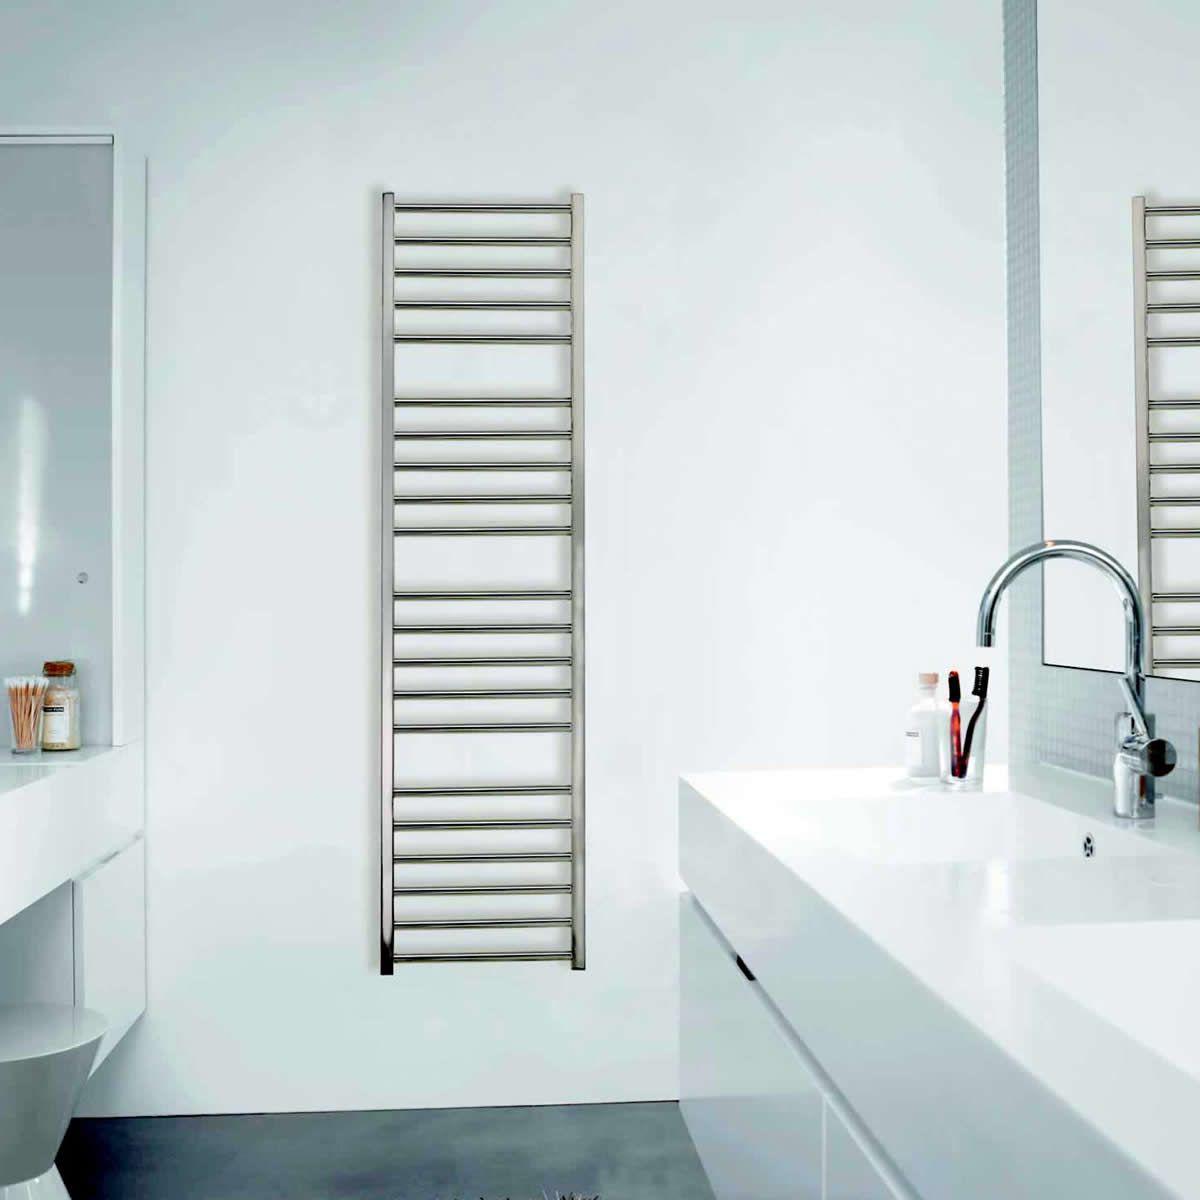 Zehnder Stellar Spa Stainless Steel Radiator Uk Bathrooms